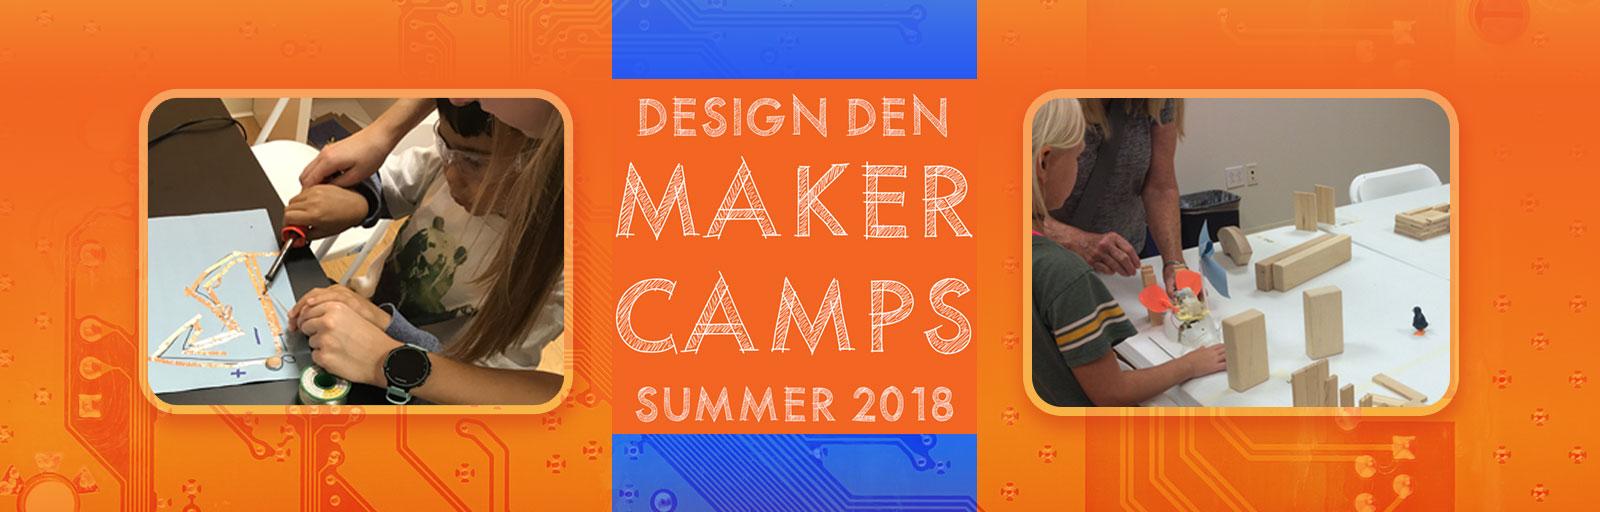 designdenmakercamp2018